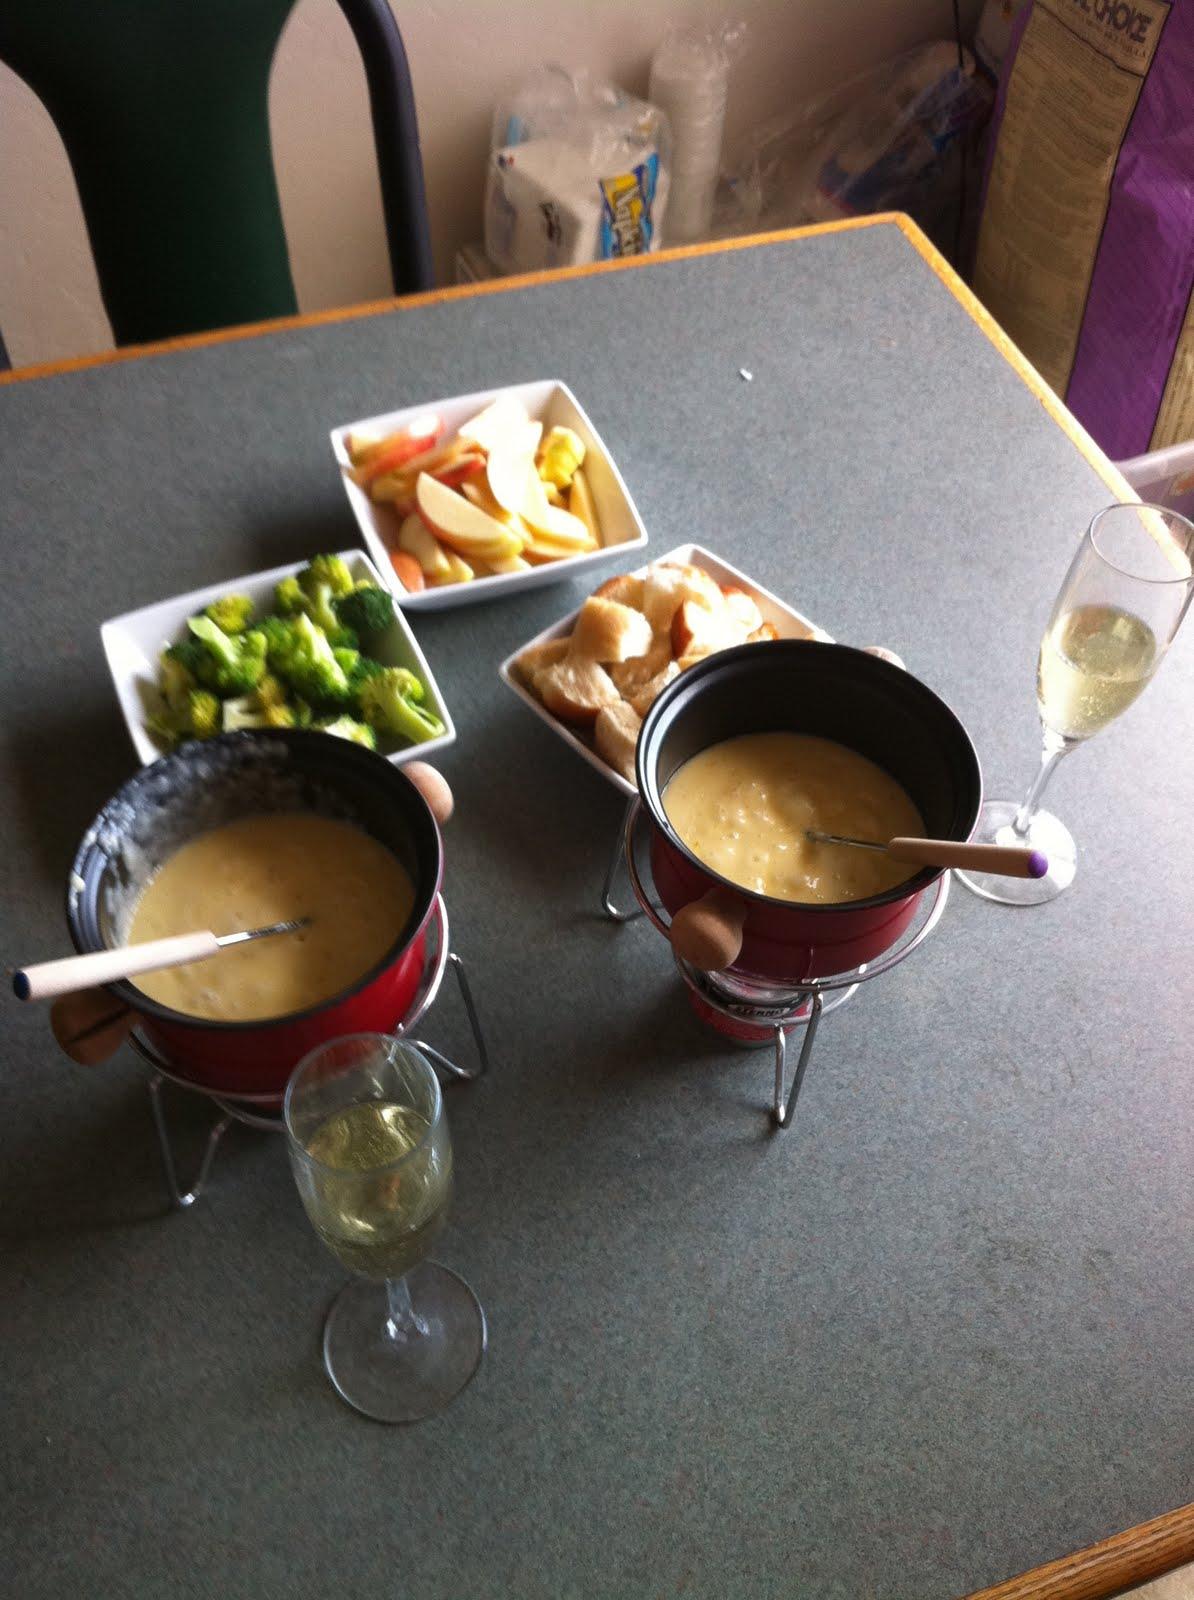 Three cheese (Brie, Gruyere, Fontina) fondue with Champagne